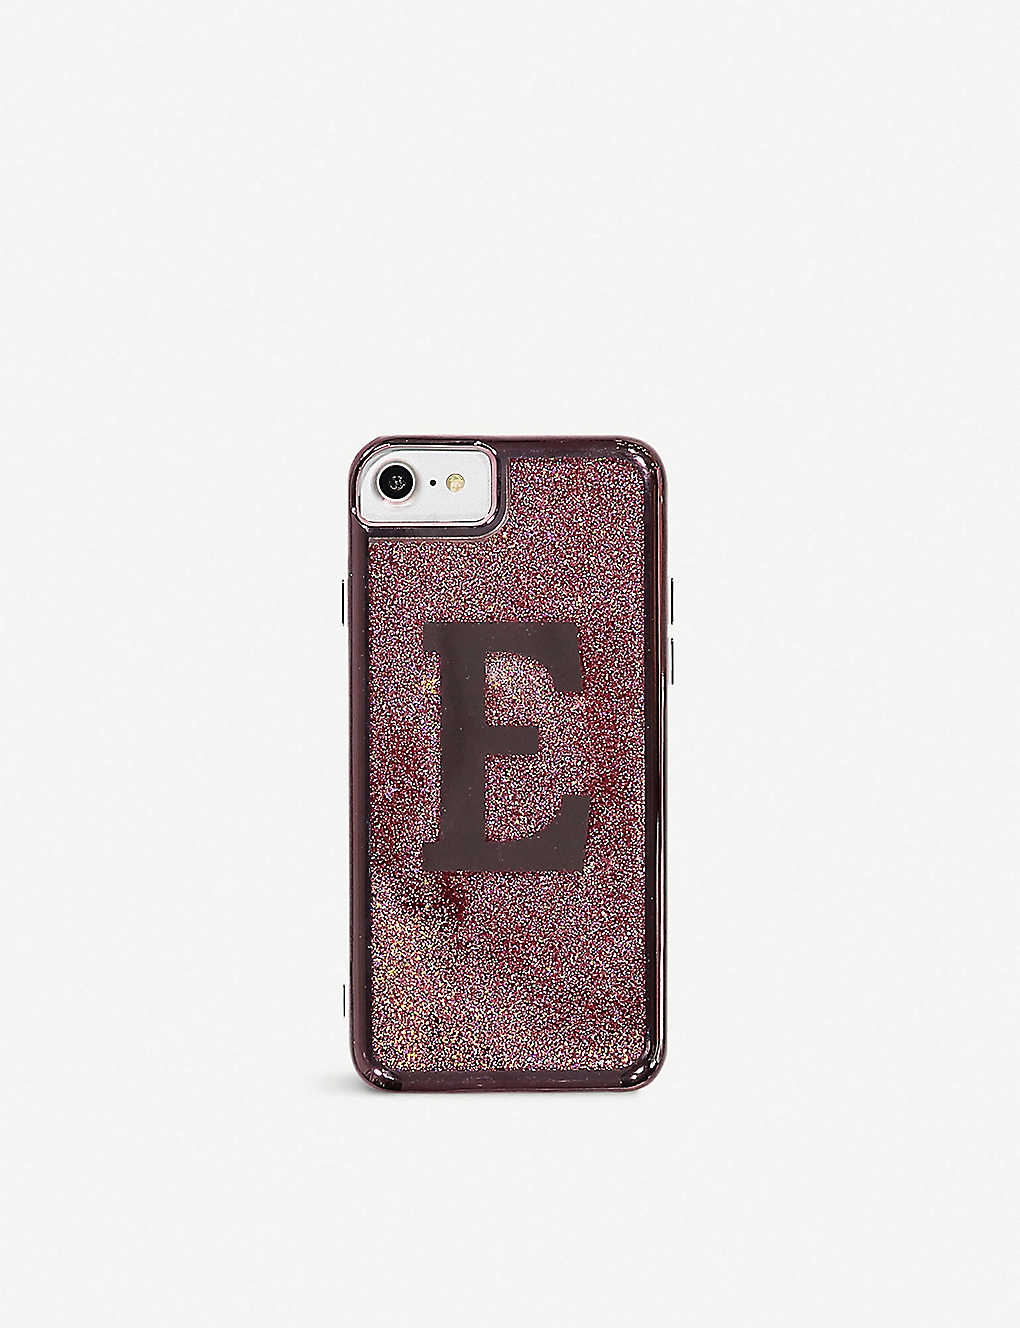 reputable site 55a7e 8e06a Shake It phone case iPhone 6 7 8